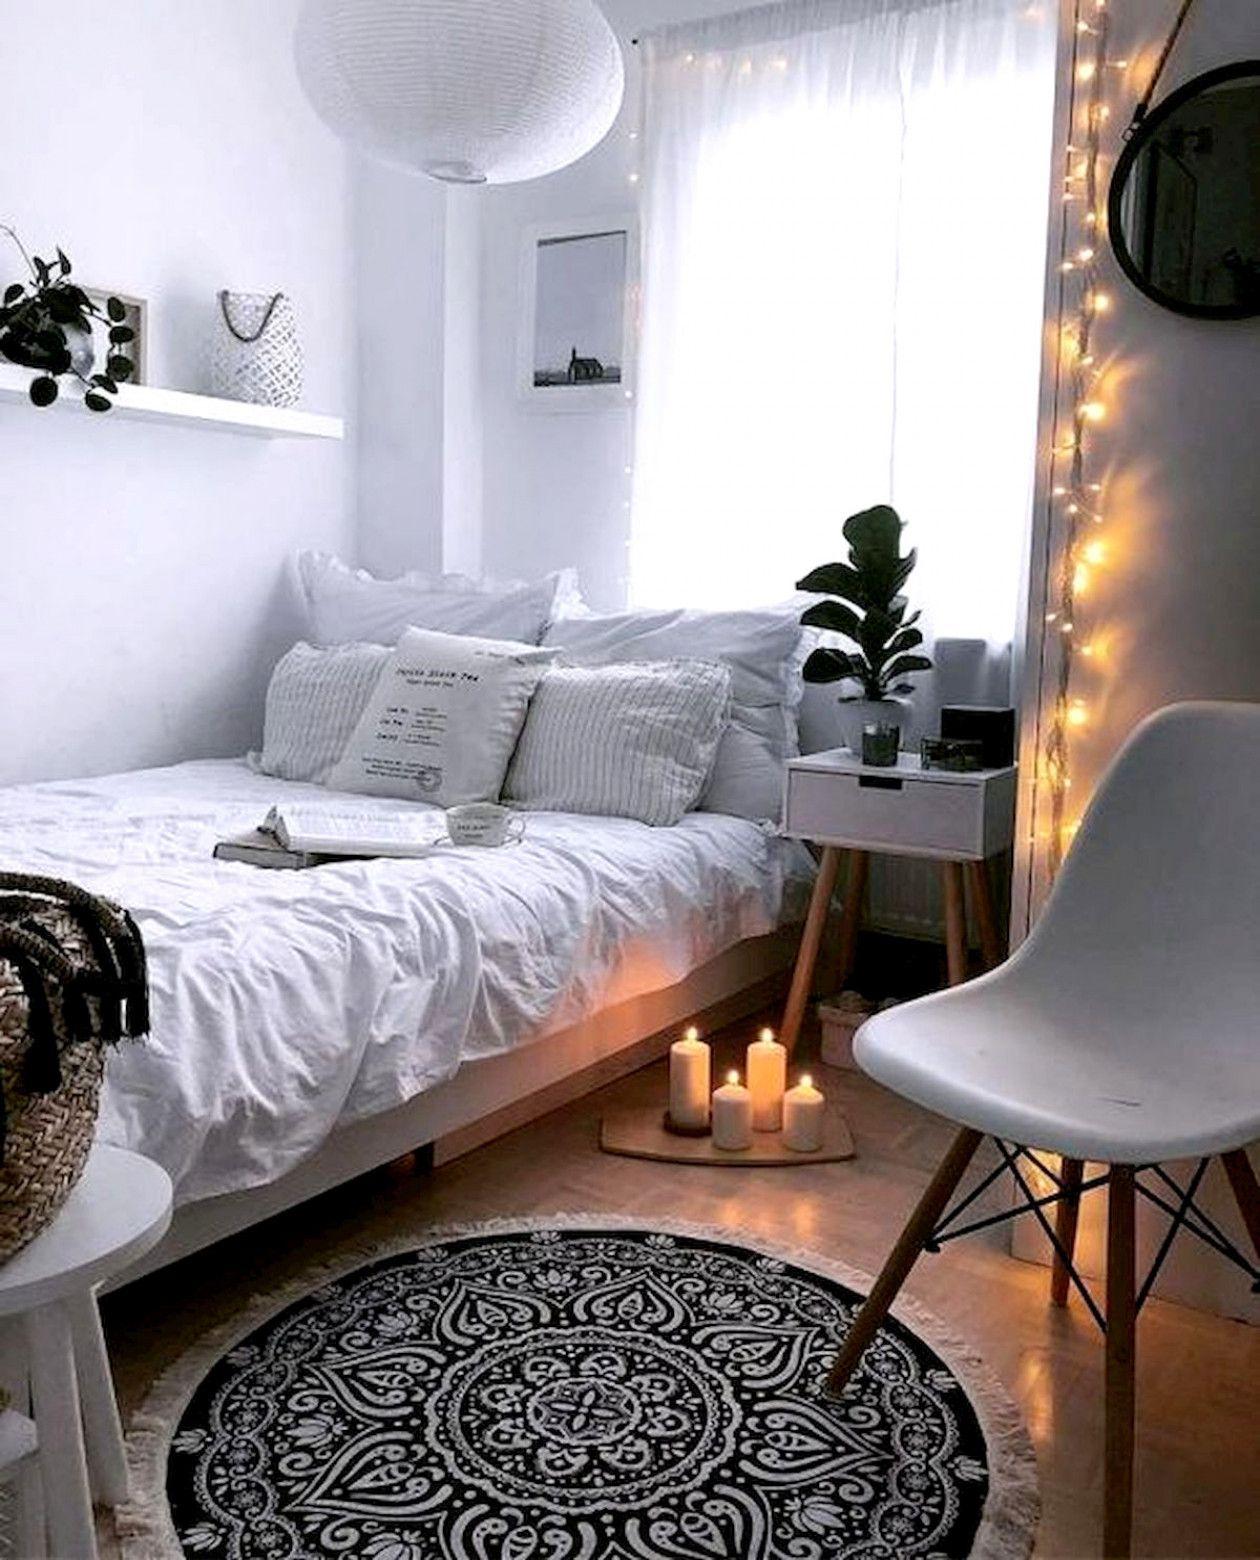 Queensizebed Small Apartment Bedrooms College Bedroom Decor Apartment Bedroom Design